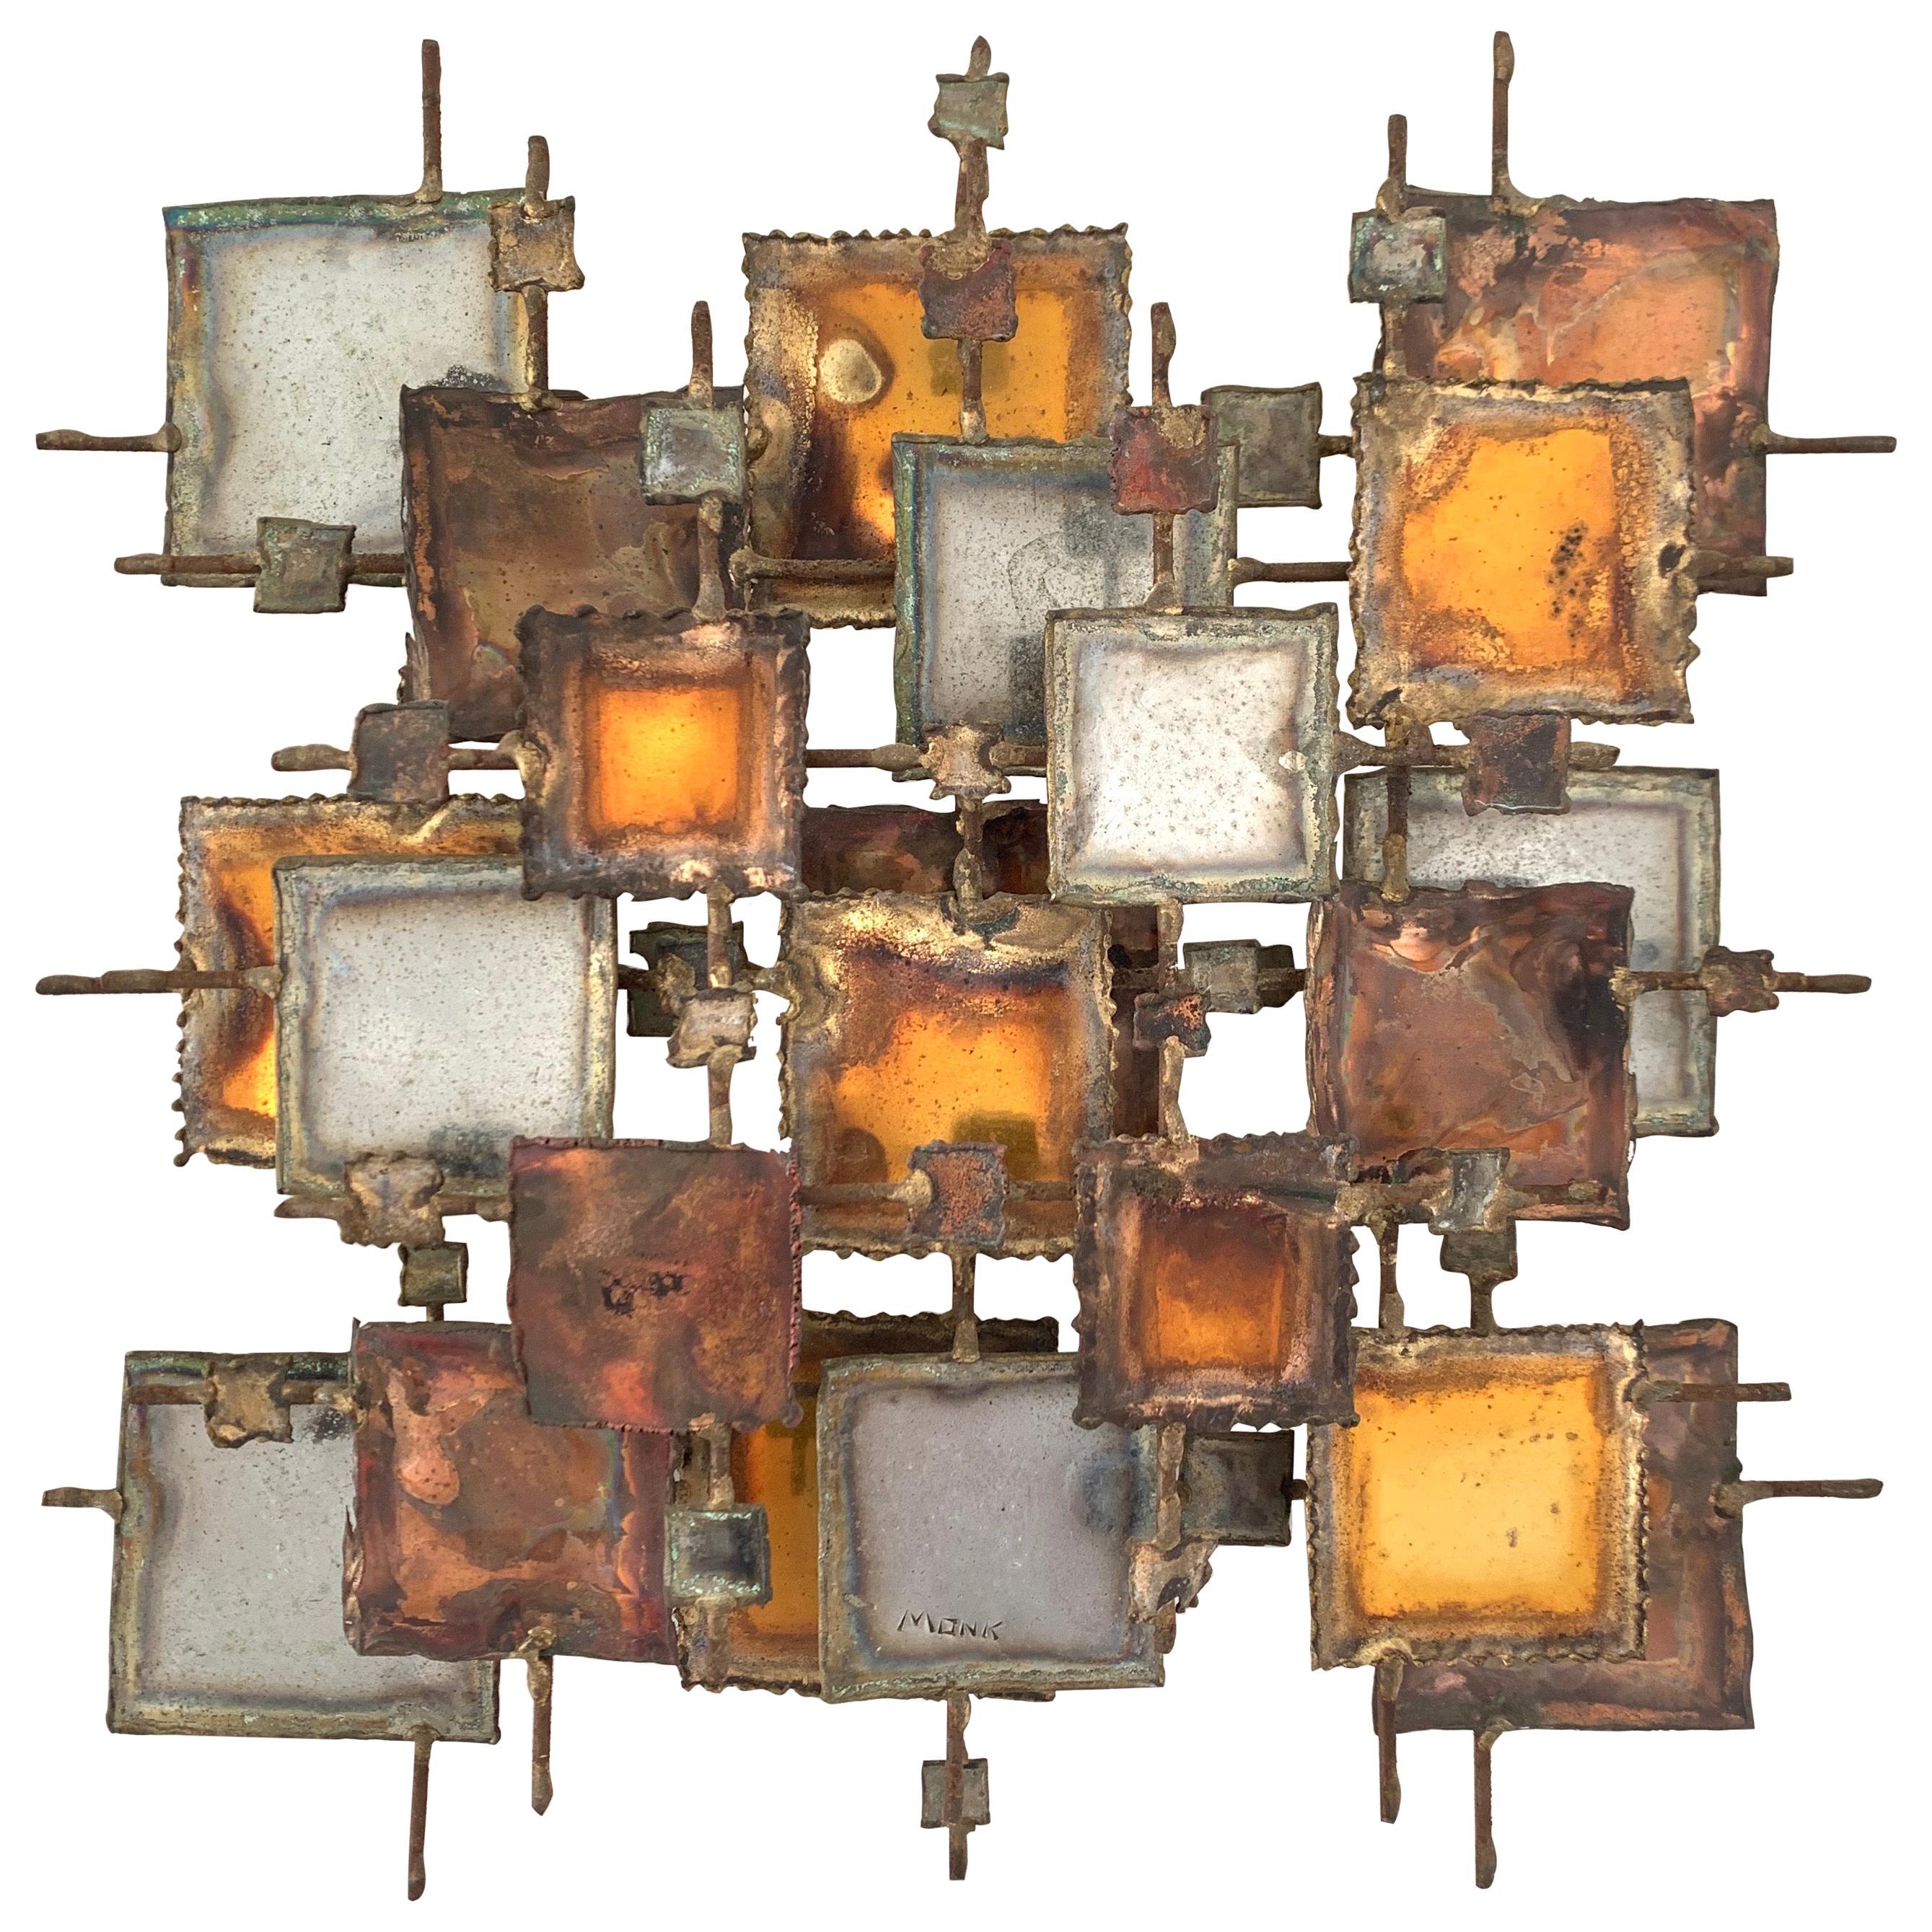 Brutalist Bronze, Copper, Brass, and Steel Wall Sculpture, 1970, Signed MONK